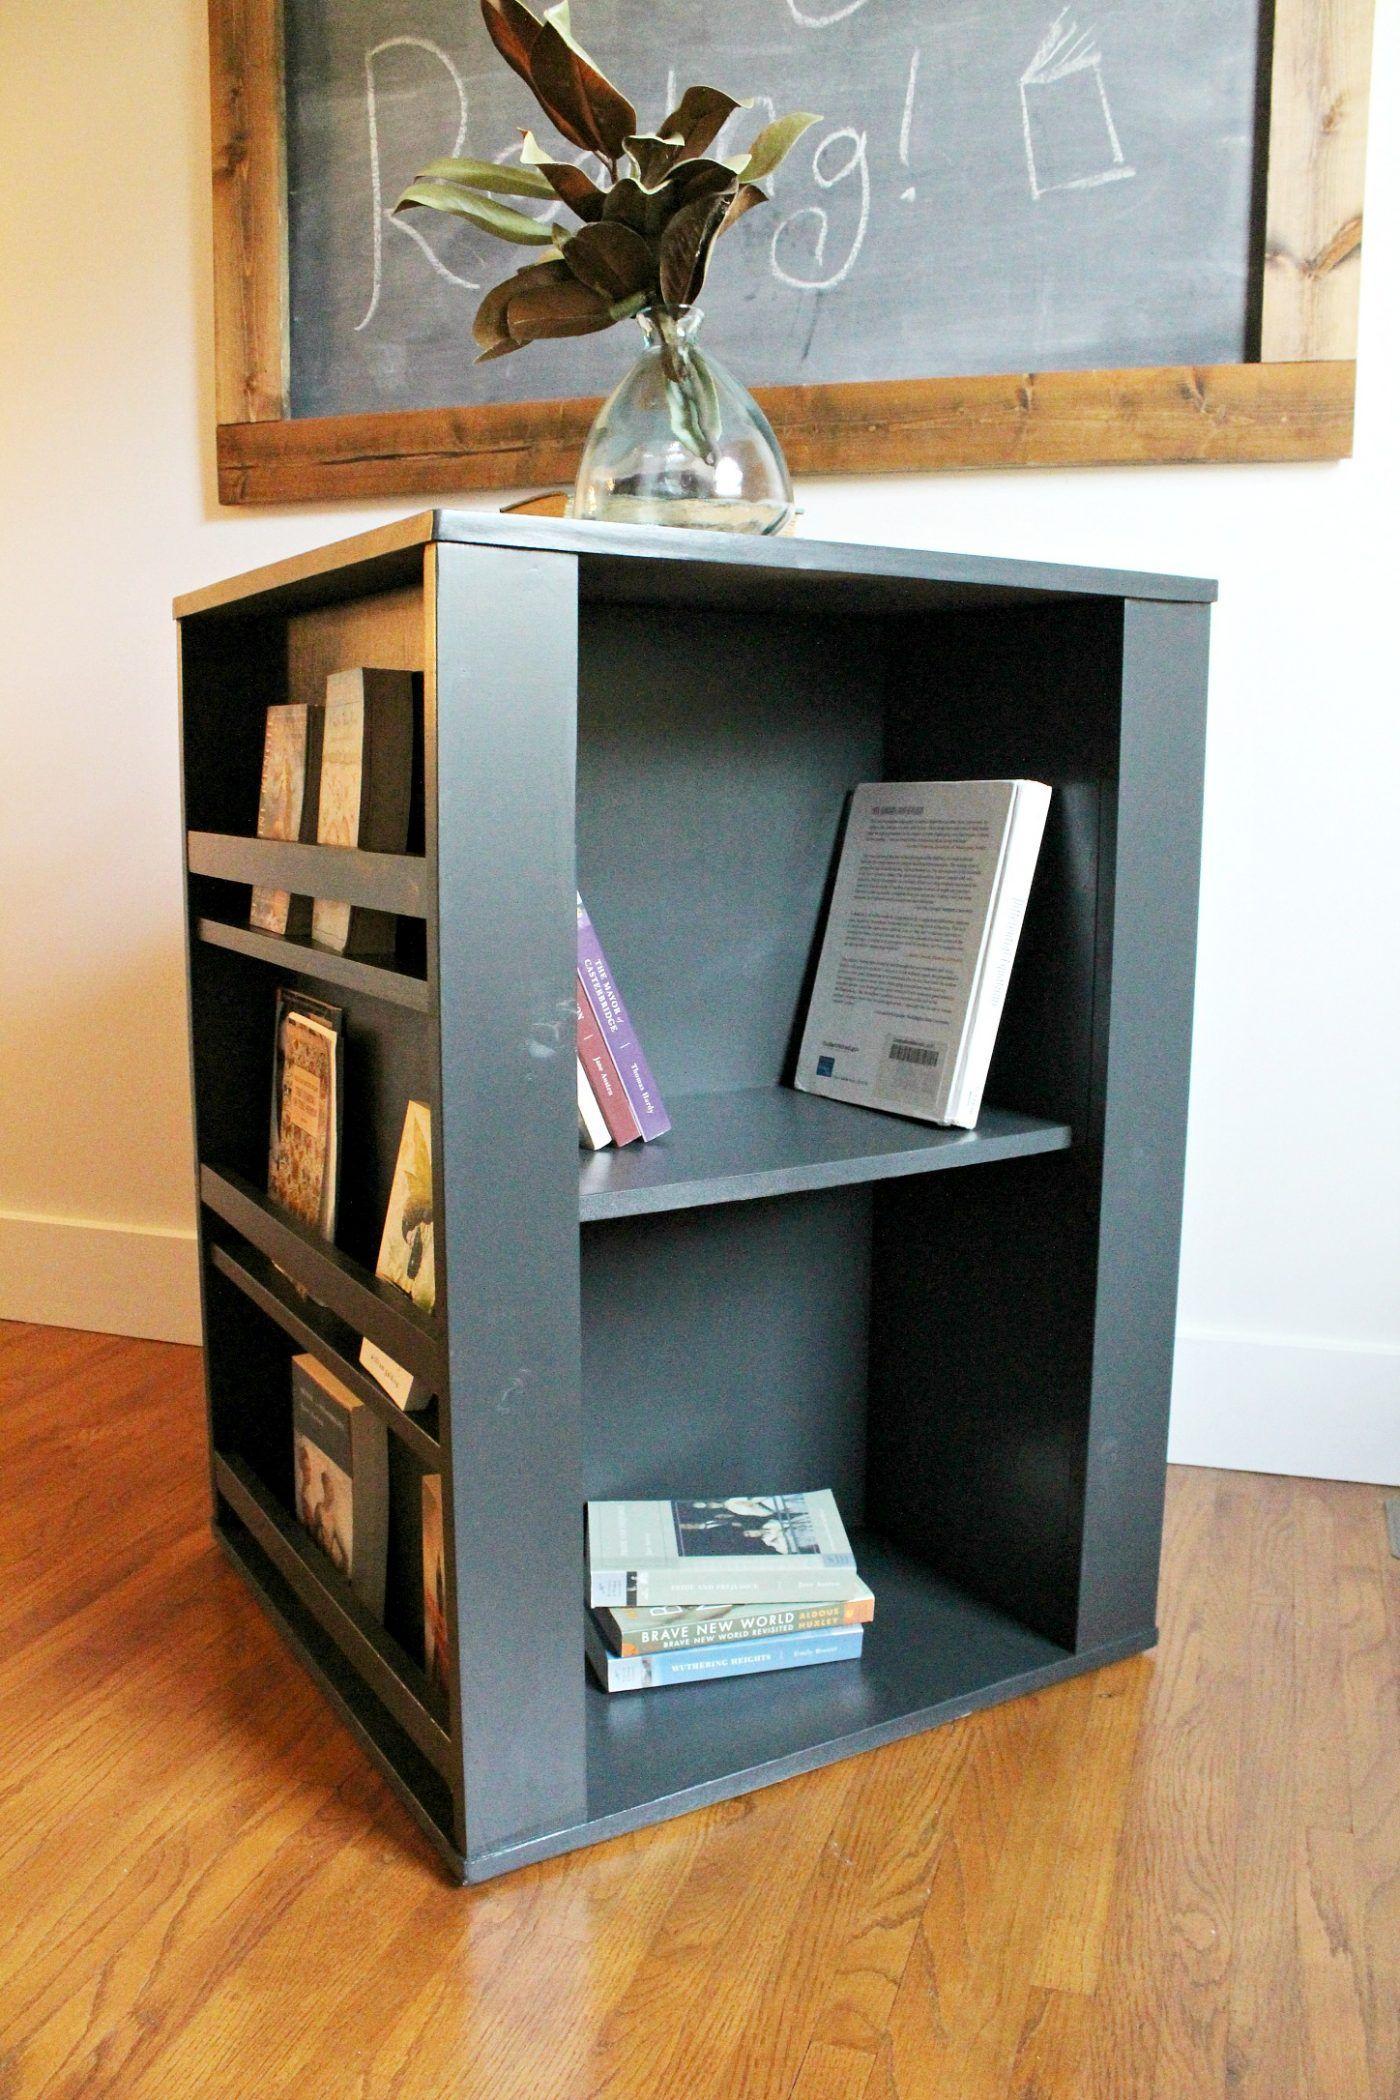 DIY Four Sided Kids Bookshelf